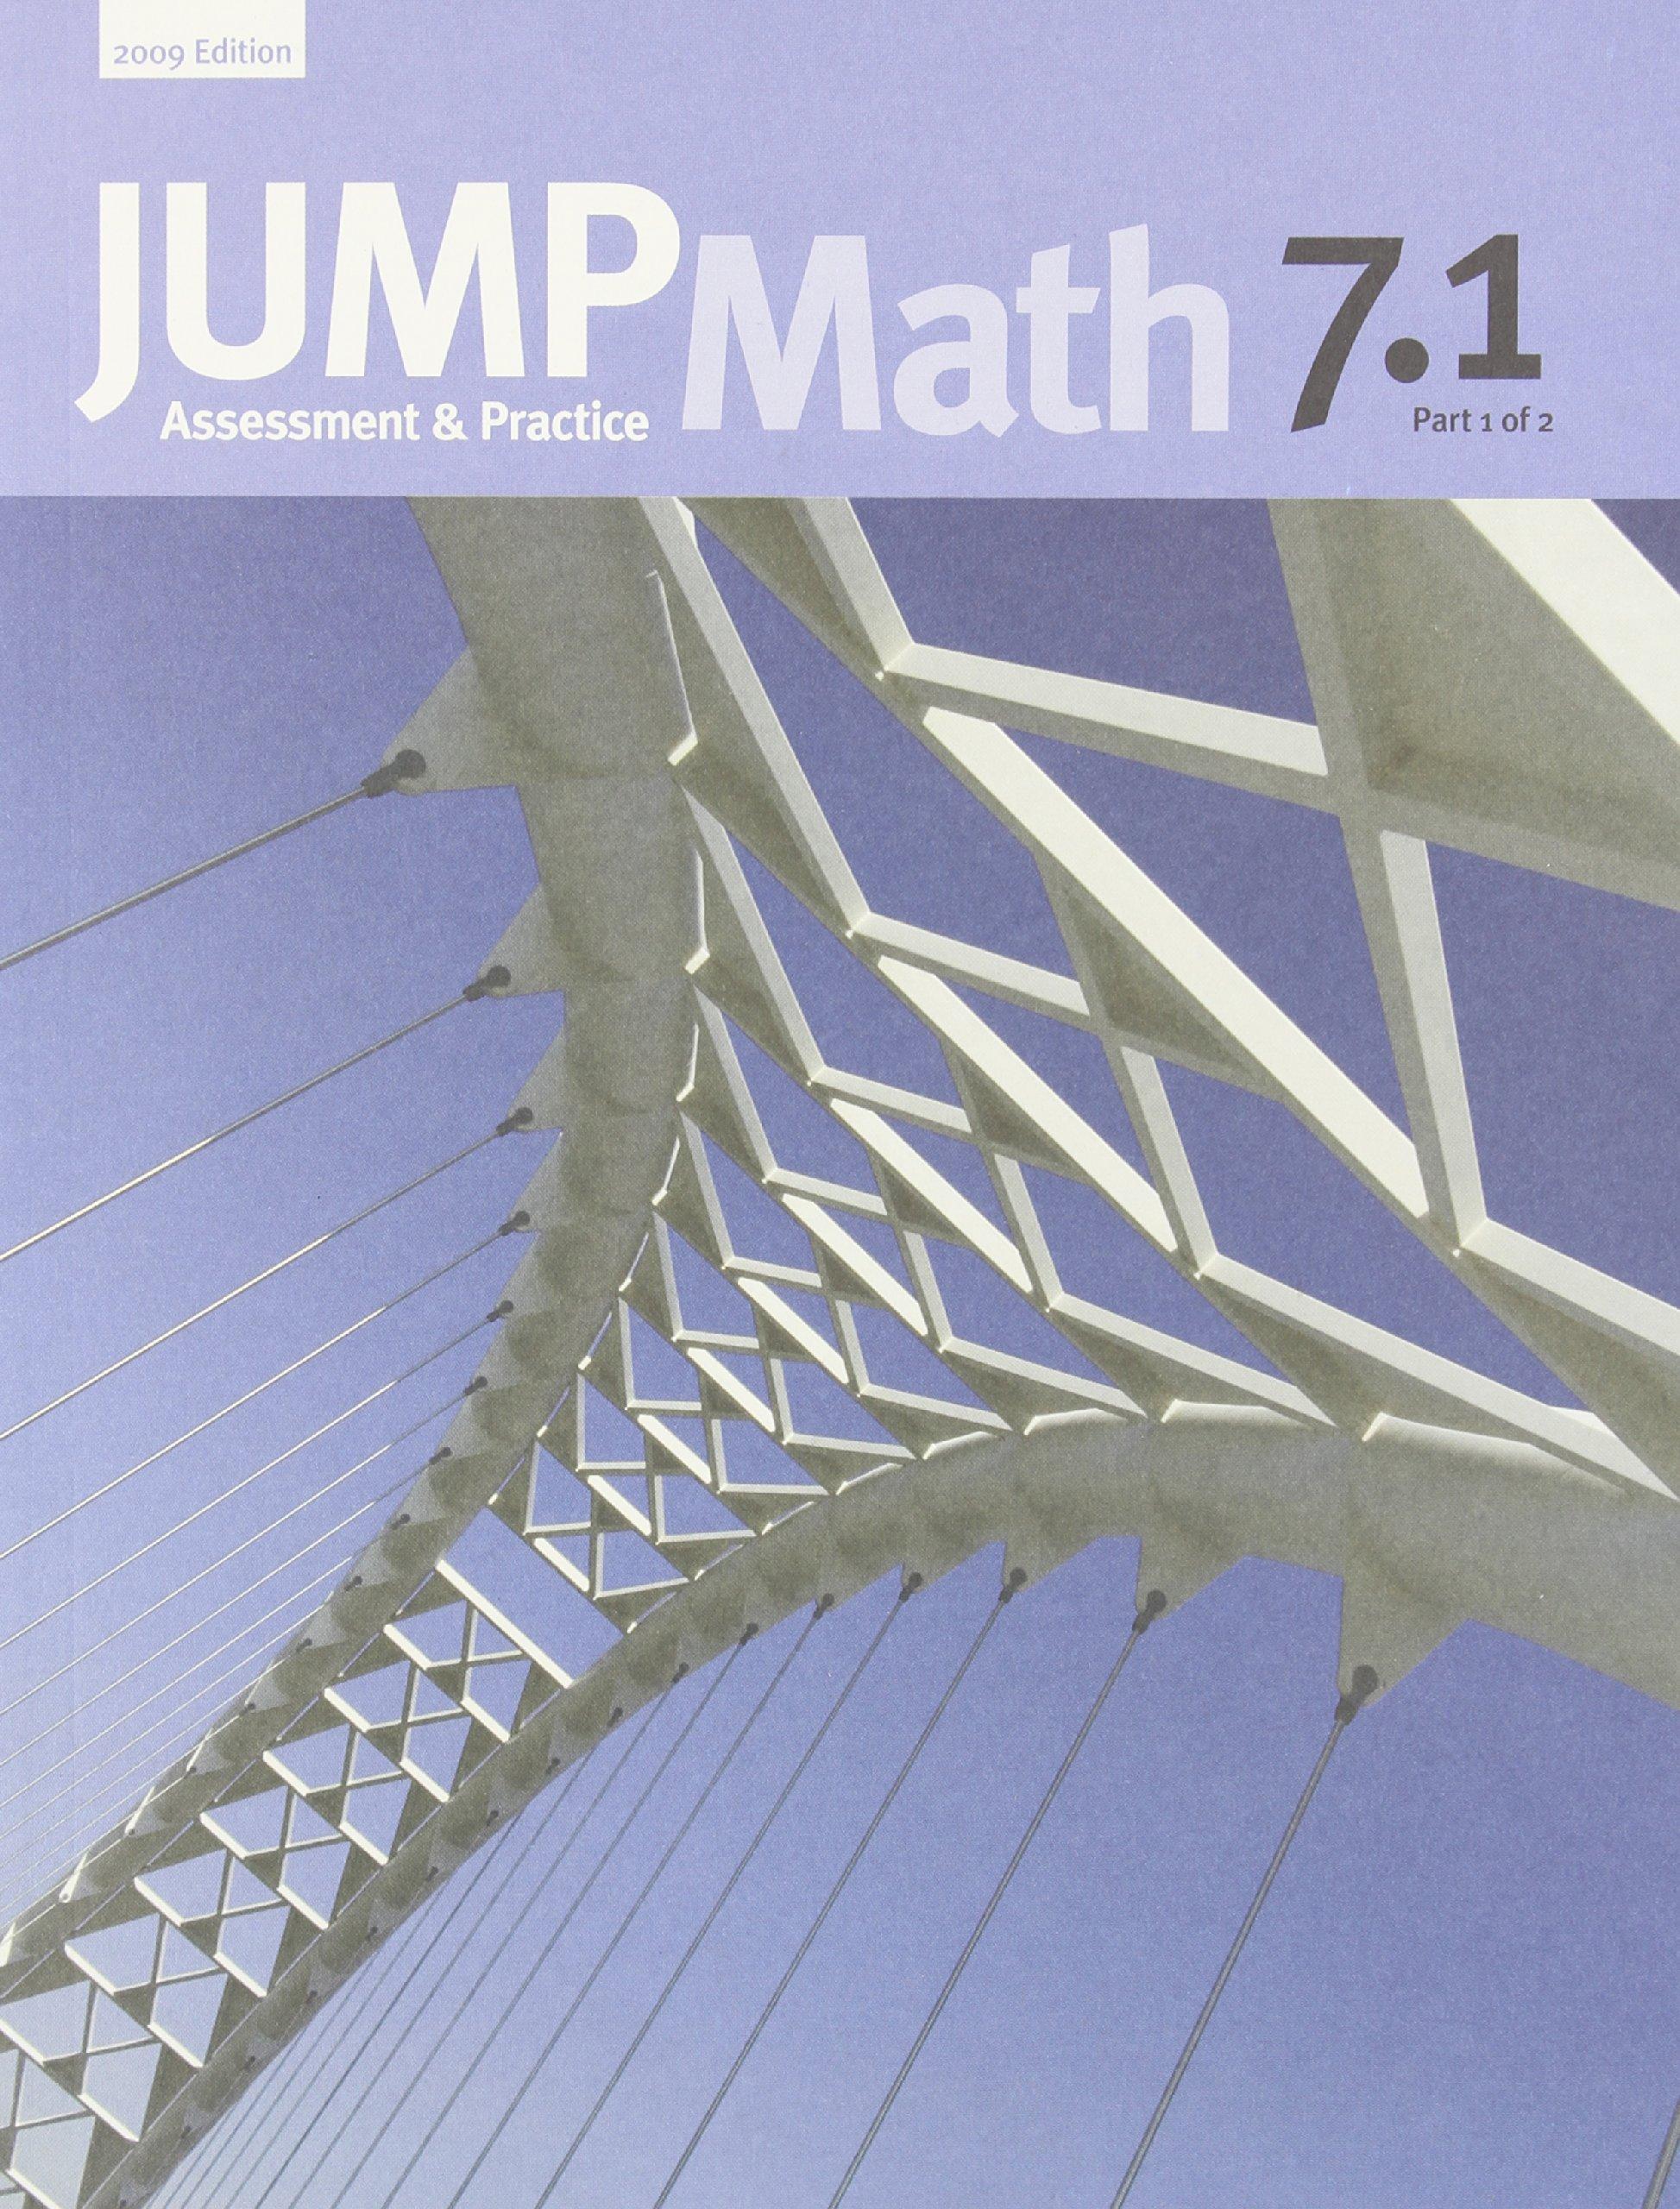 JUMP Math 7.1: Book 7, Part 1 of 2: Amazon.ca: John Mighton, JUMP ...